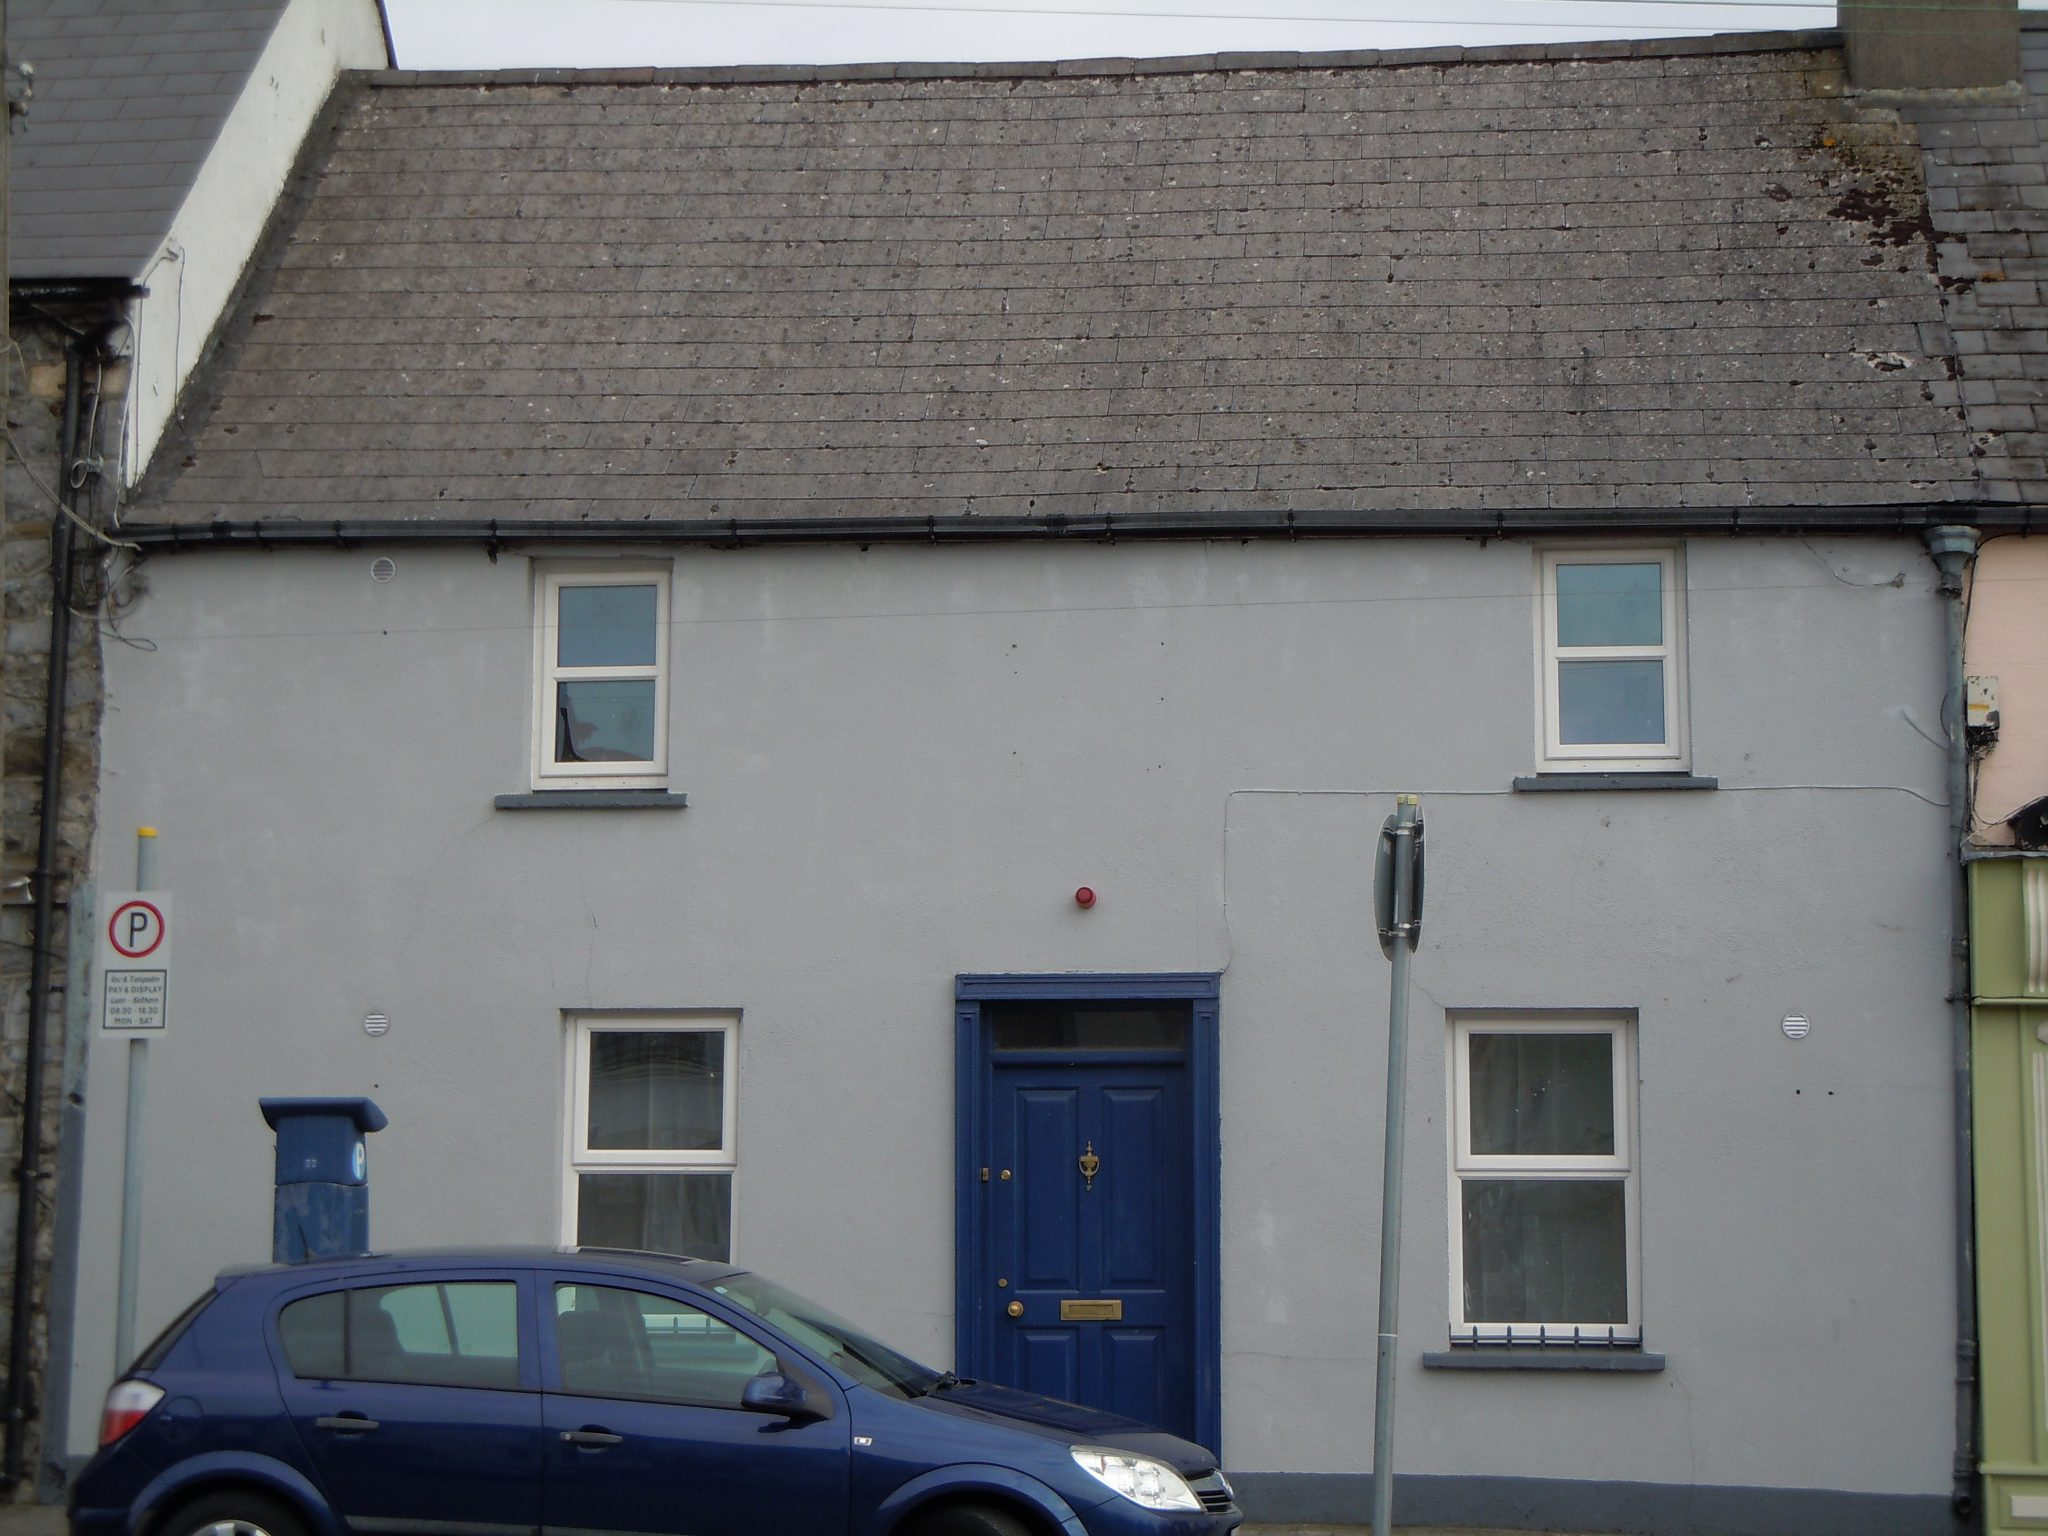 Tullow Street (ref 413), Carlow